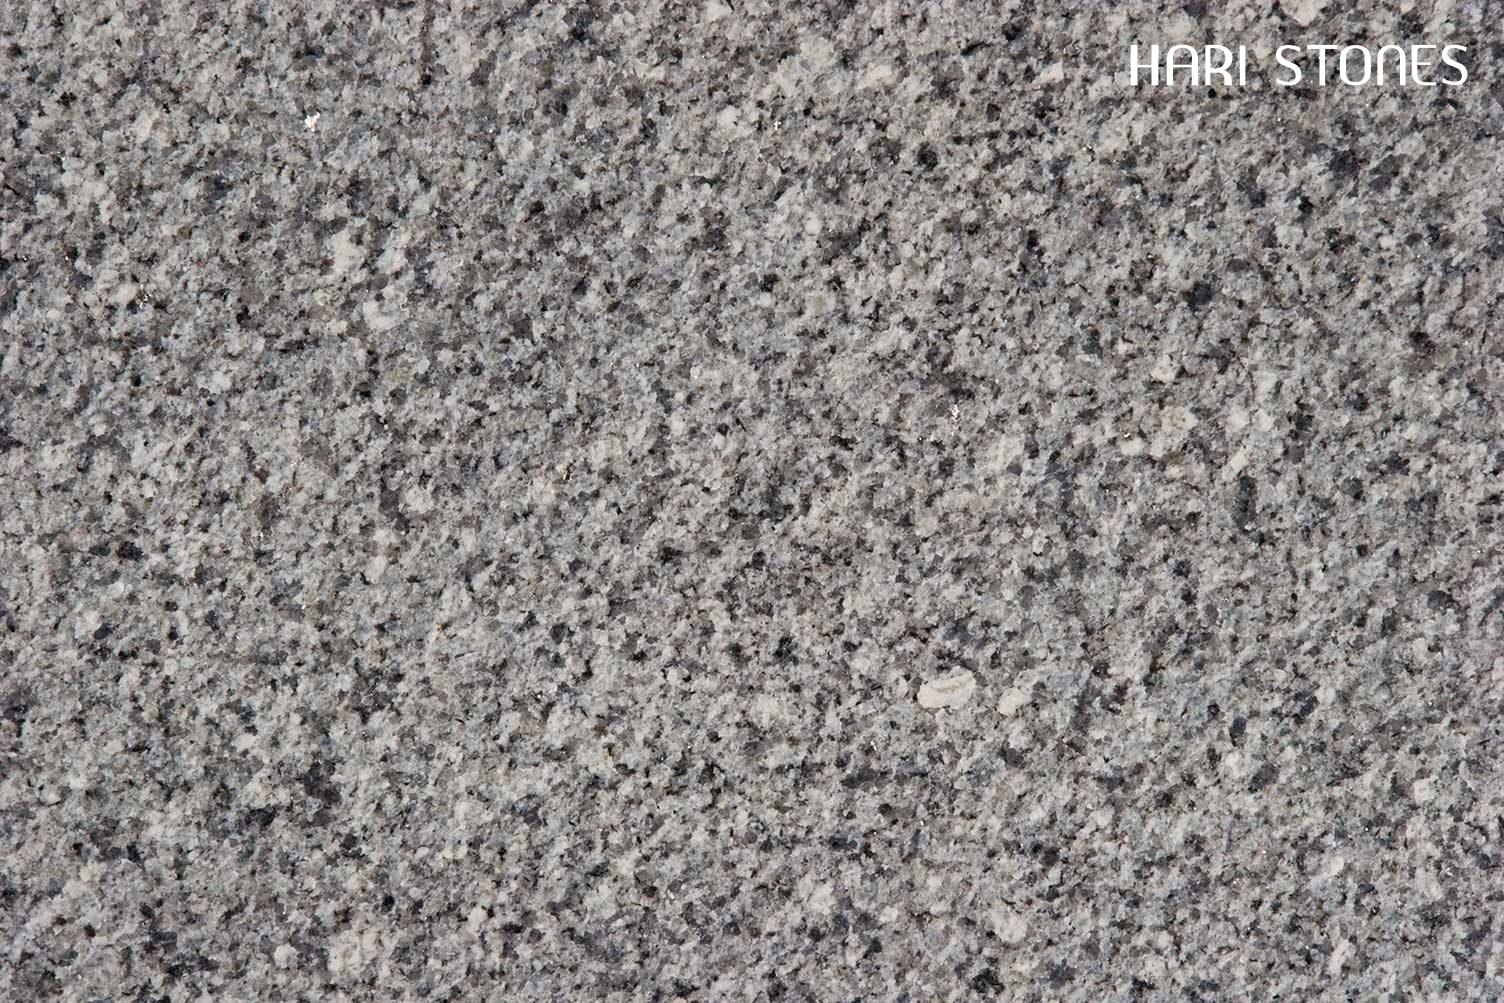 Azul Platino Granite Slabs Suppliers